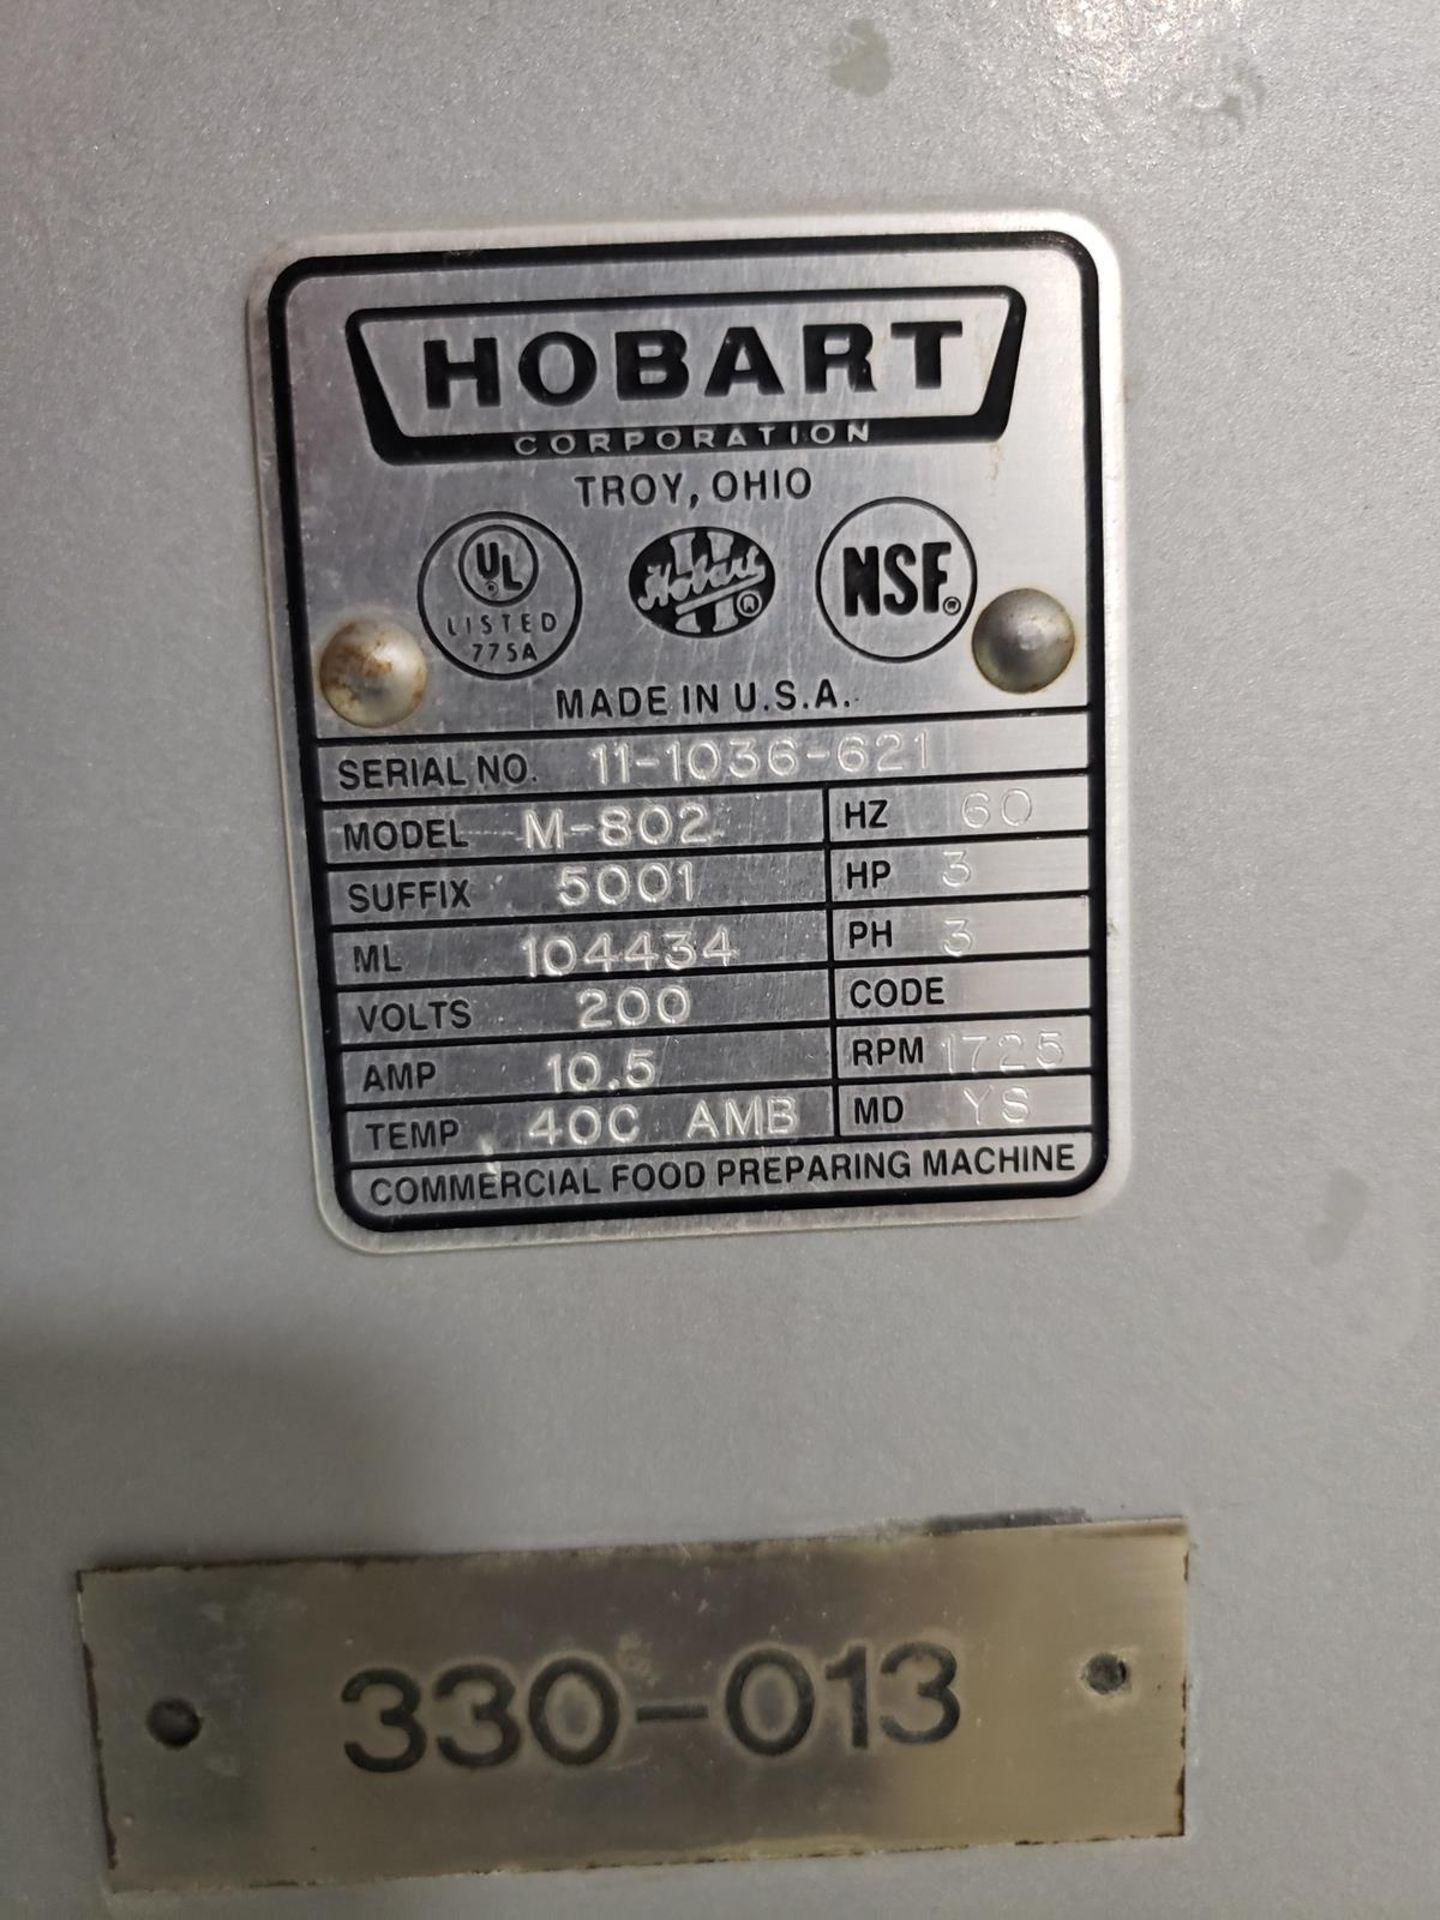 Lot 21 - 2011 Hobart 80 Quart Mixer, M# M-802, S/N 11-1036-621 - Loc: NJ | Rig Fee: $100